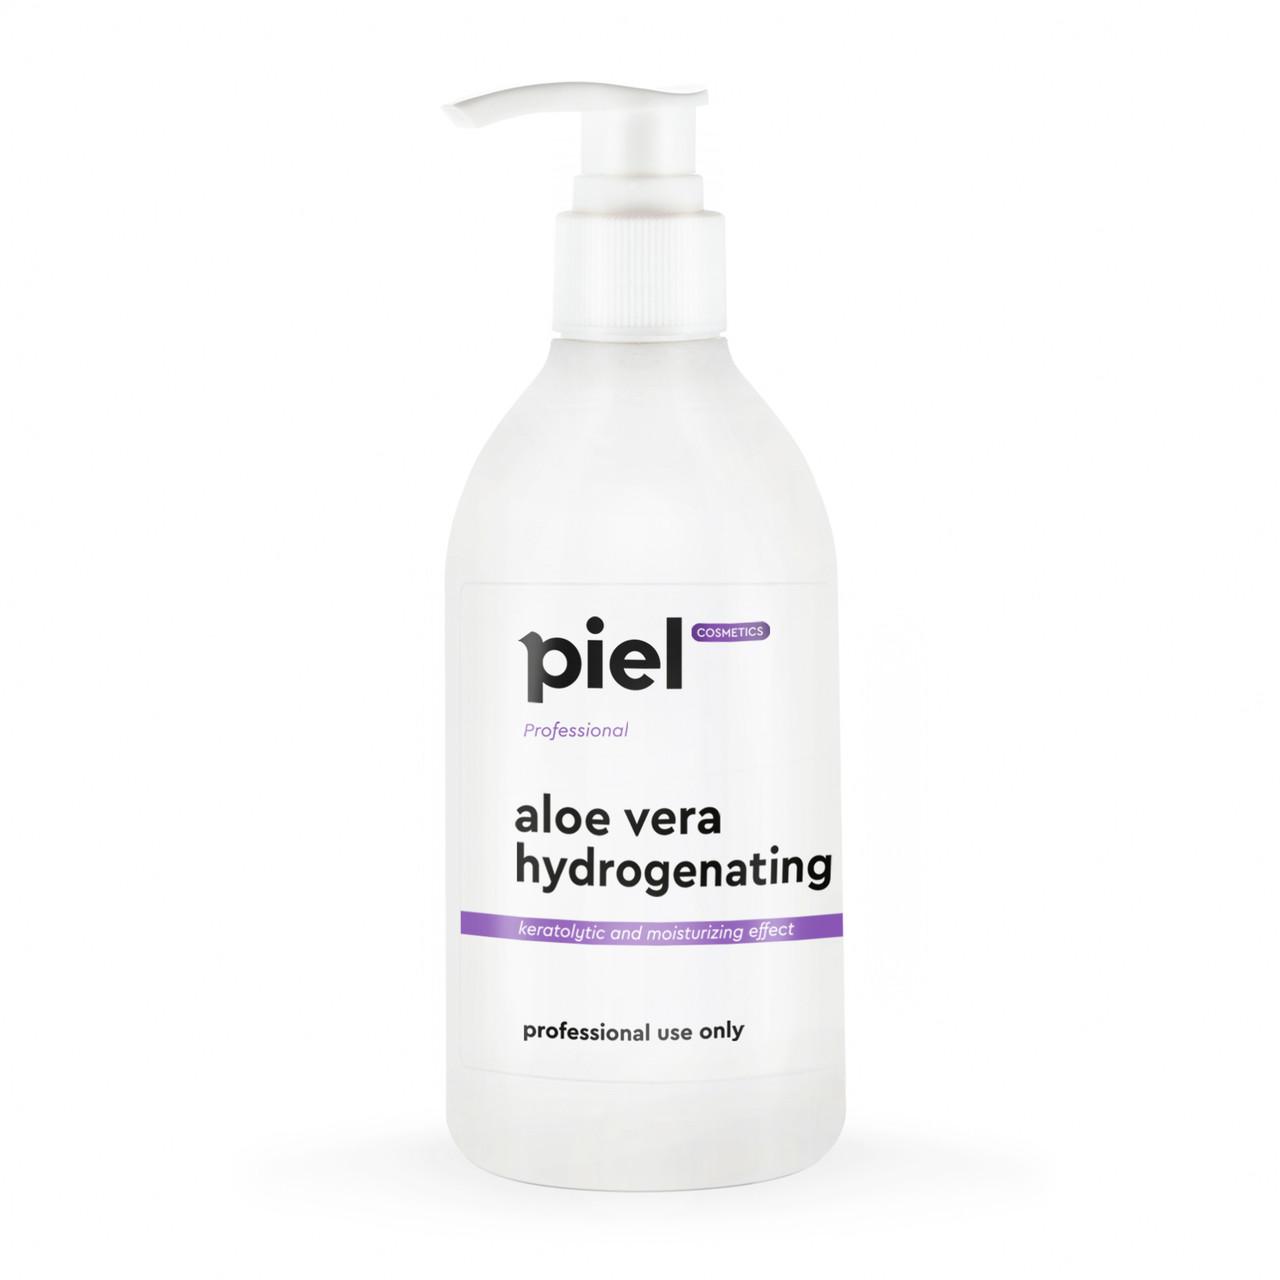 Aloe Vera Hydrogenating Gel Гідруючий гель з алое вера Piel Cosmetics 300 мл